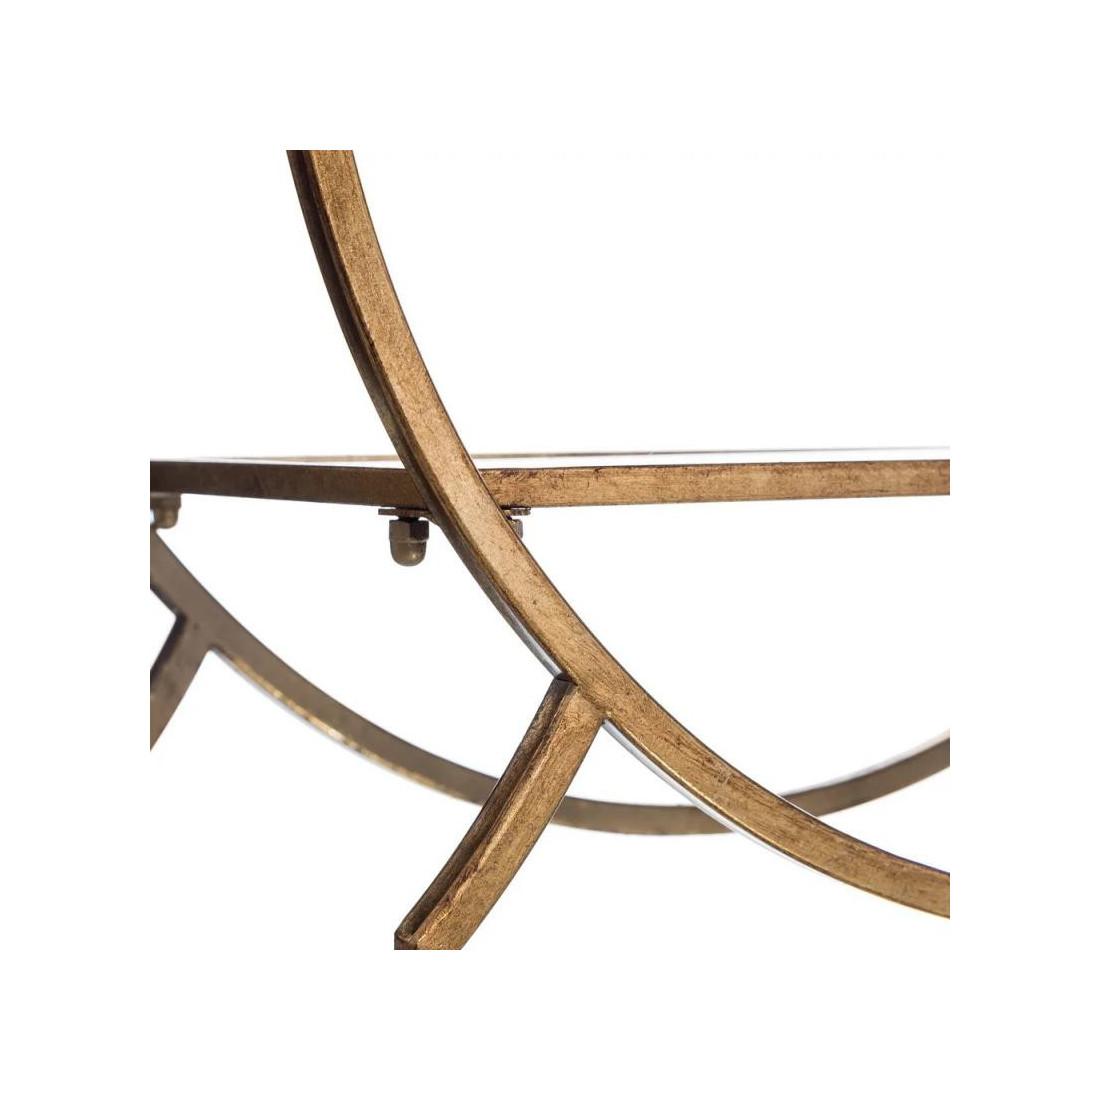 desserte sur roulettes verre miroirs m tal or goldy desserte. Black Bedroom Furniture Sets. Home Design Ideas